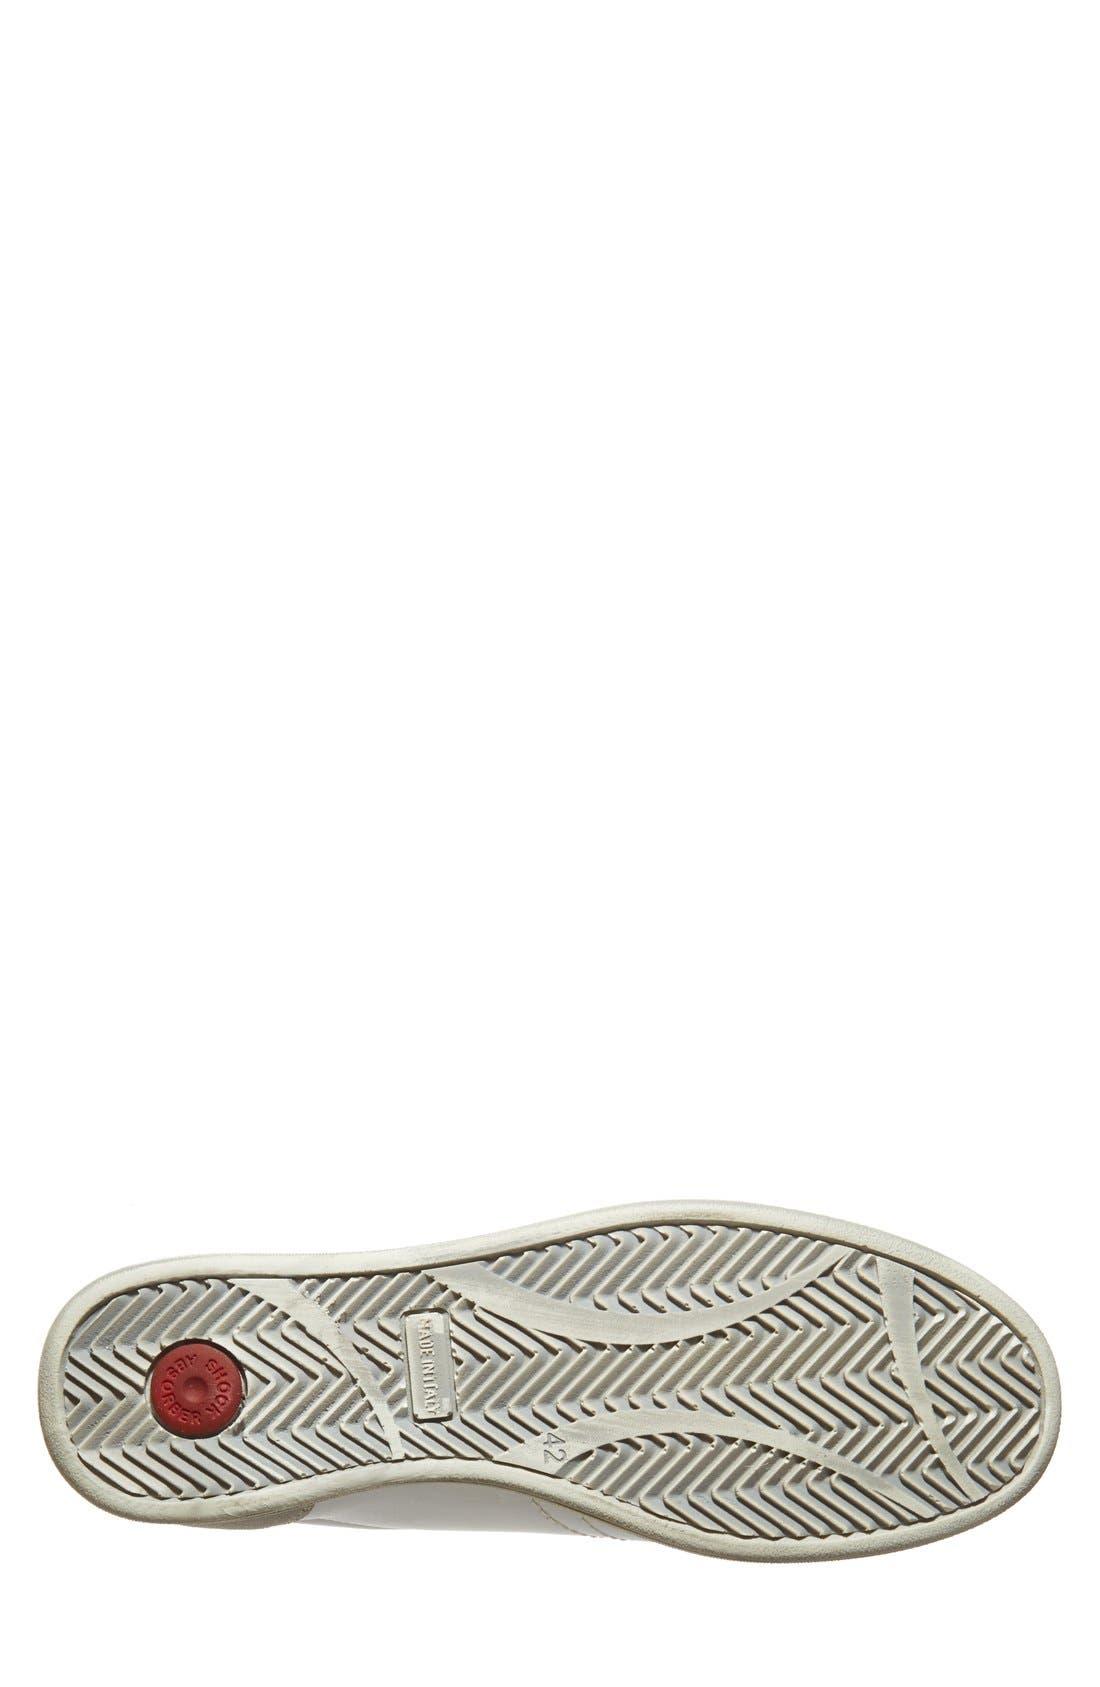 1901,                             'Monroe' Sneaker,                             Alternate thumbnail 2, color,                             100